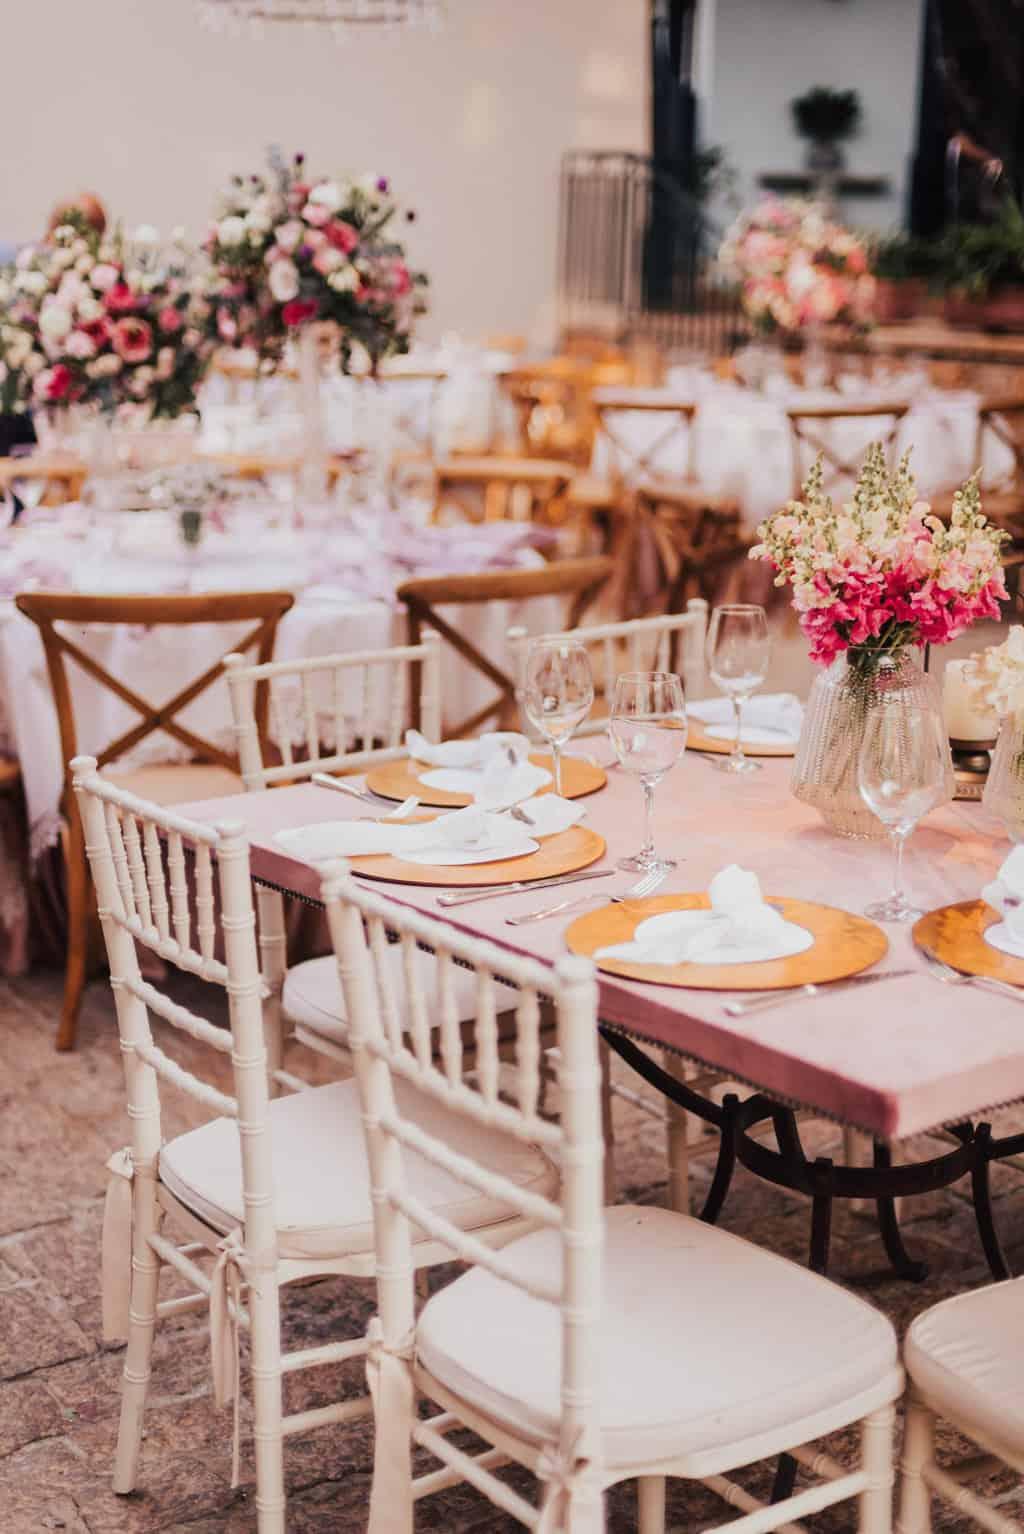 Boutique-de-Cena-casamento-Rebeca-e-Eldrey-Fazenda-Vila-Rica-Fotografia-Mana-Gollo-mesa-dos-convidados-Toda-de-Branco29